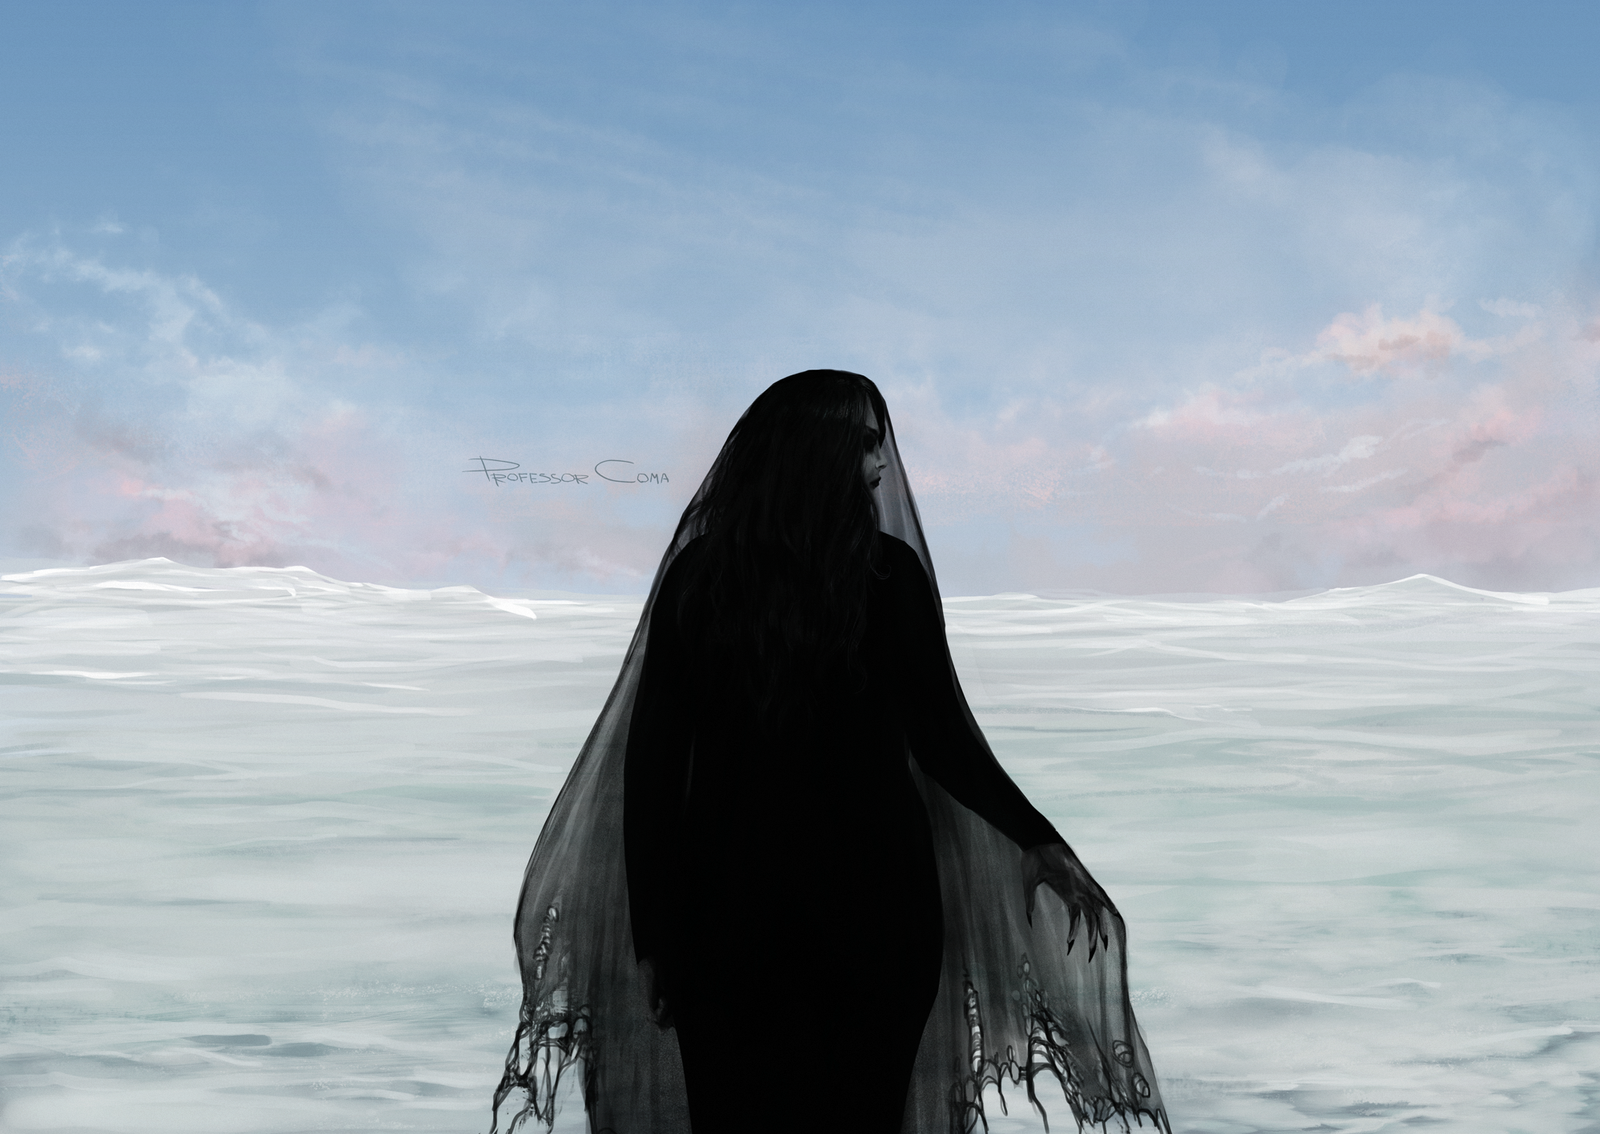 frozen stranger by drowsyghost